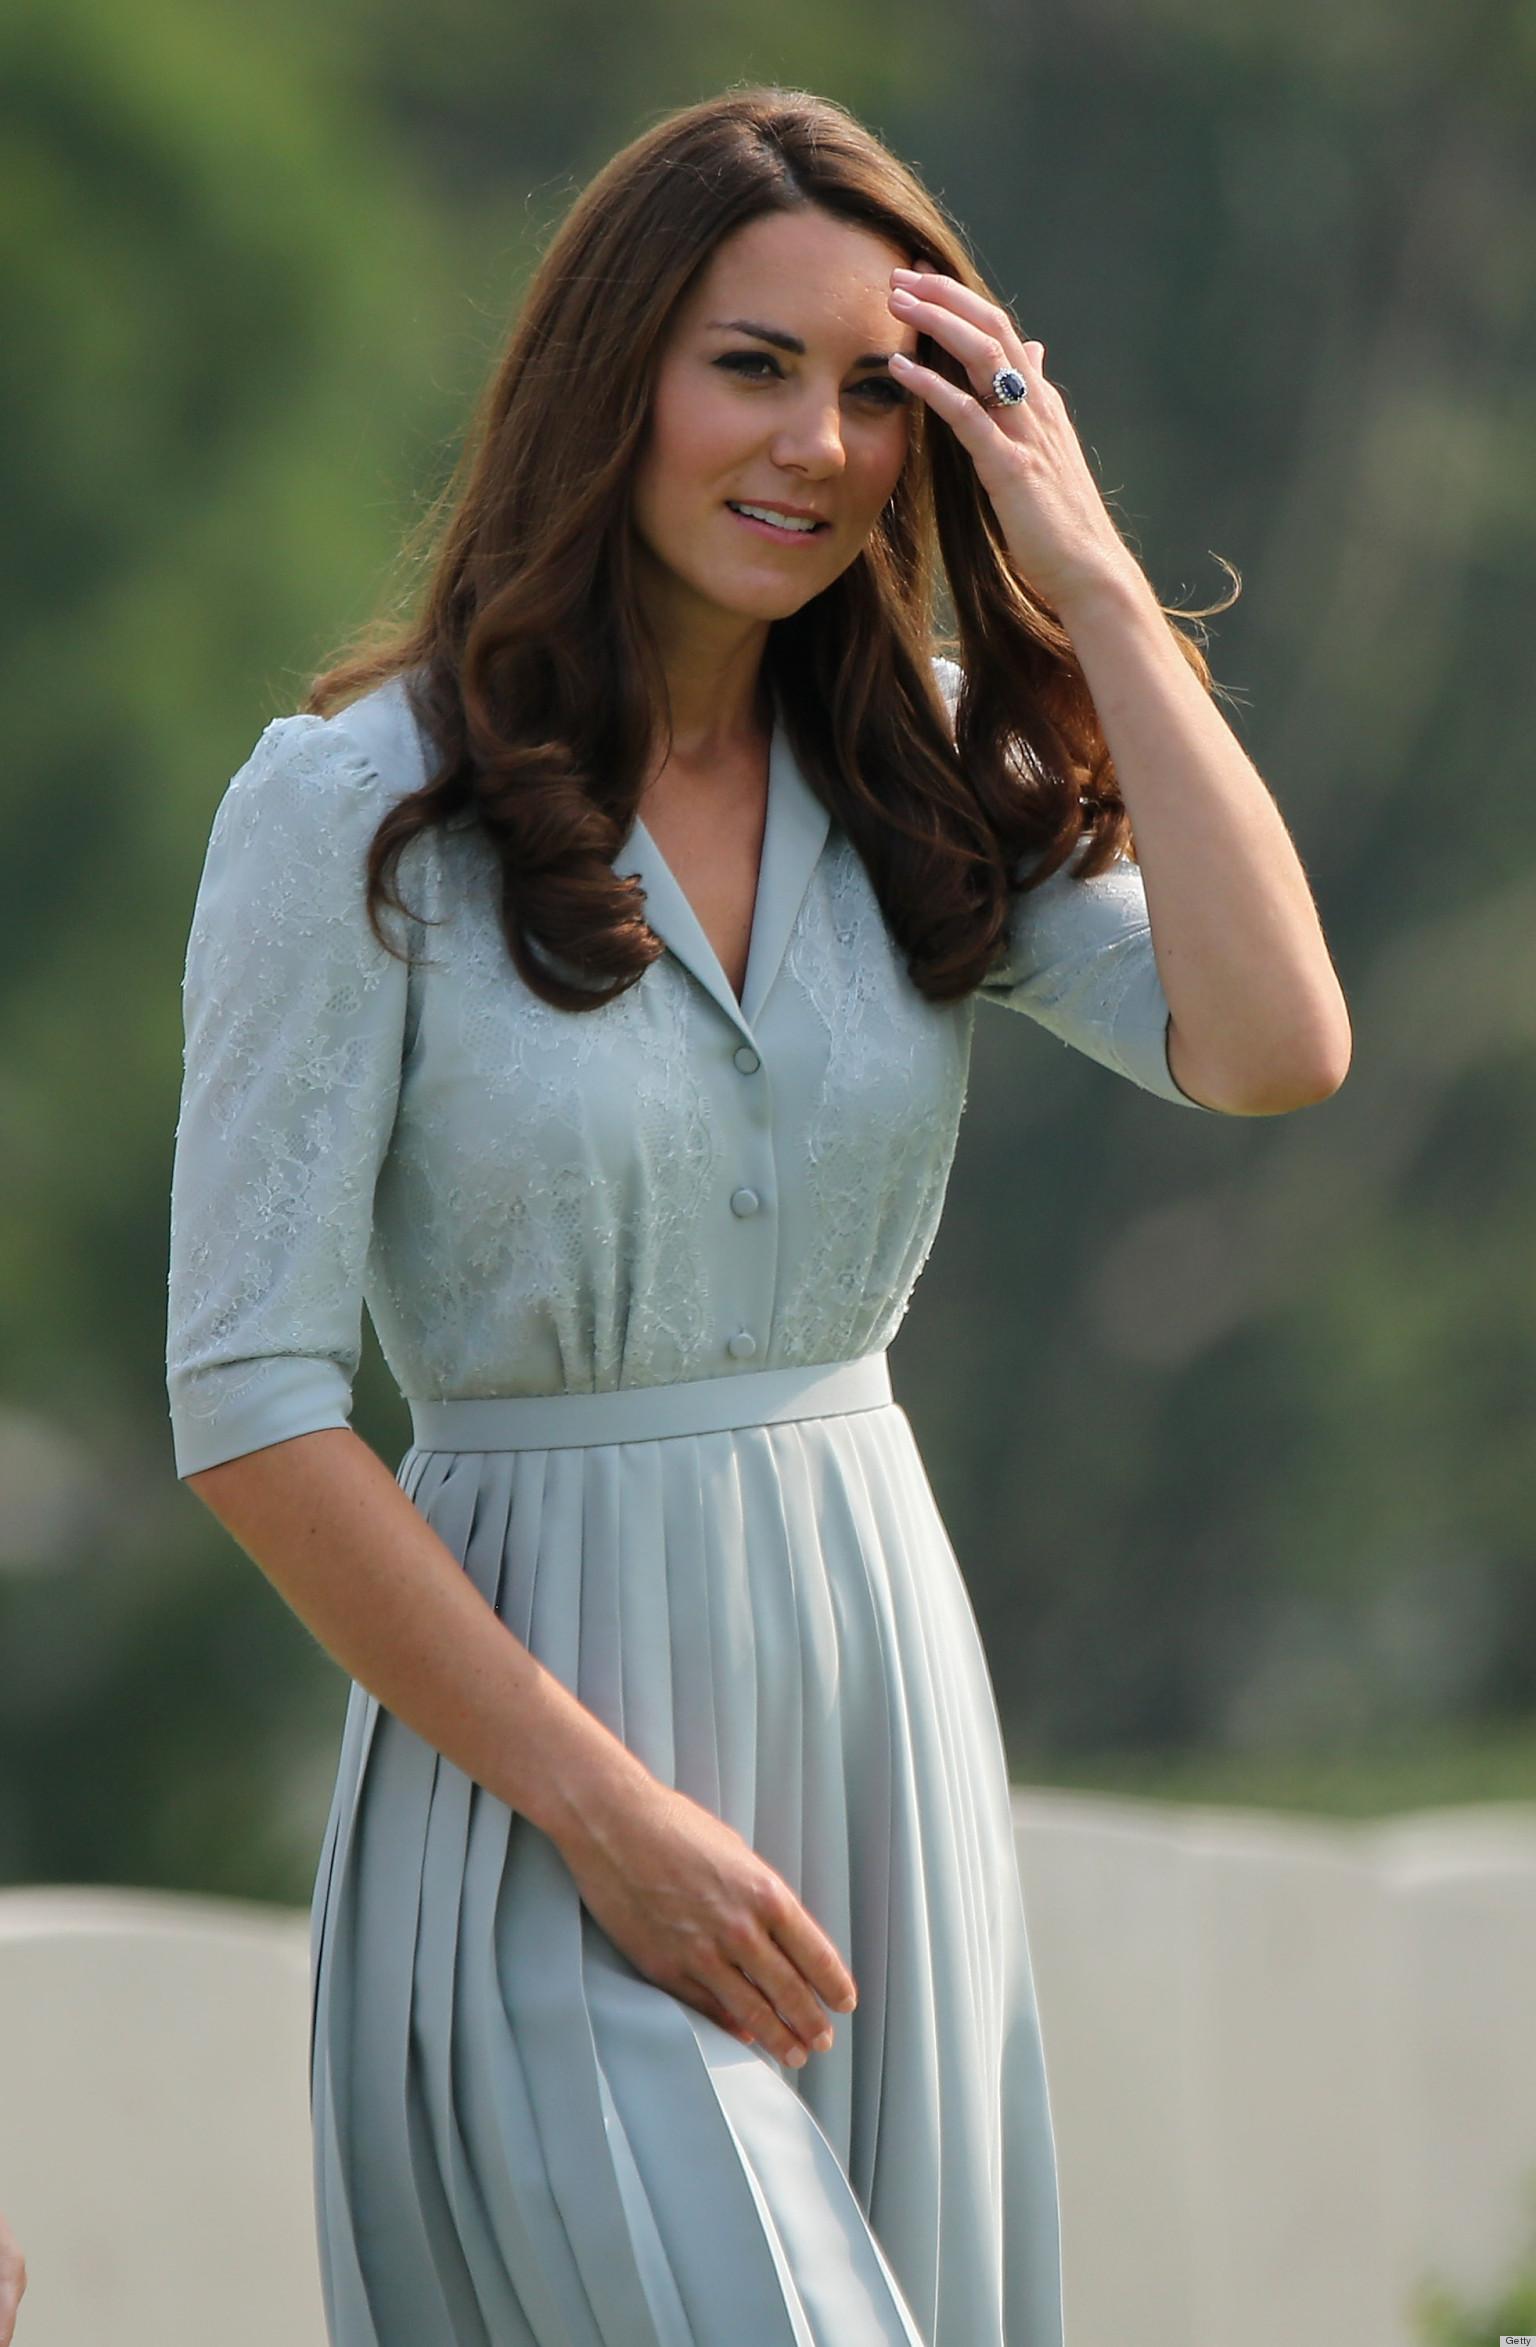 Kate Middleton Topless: Irish Daily Star Editor Michael O